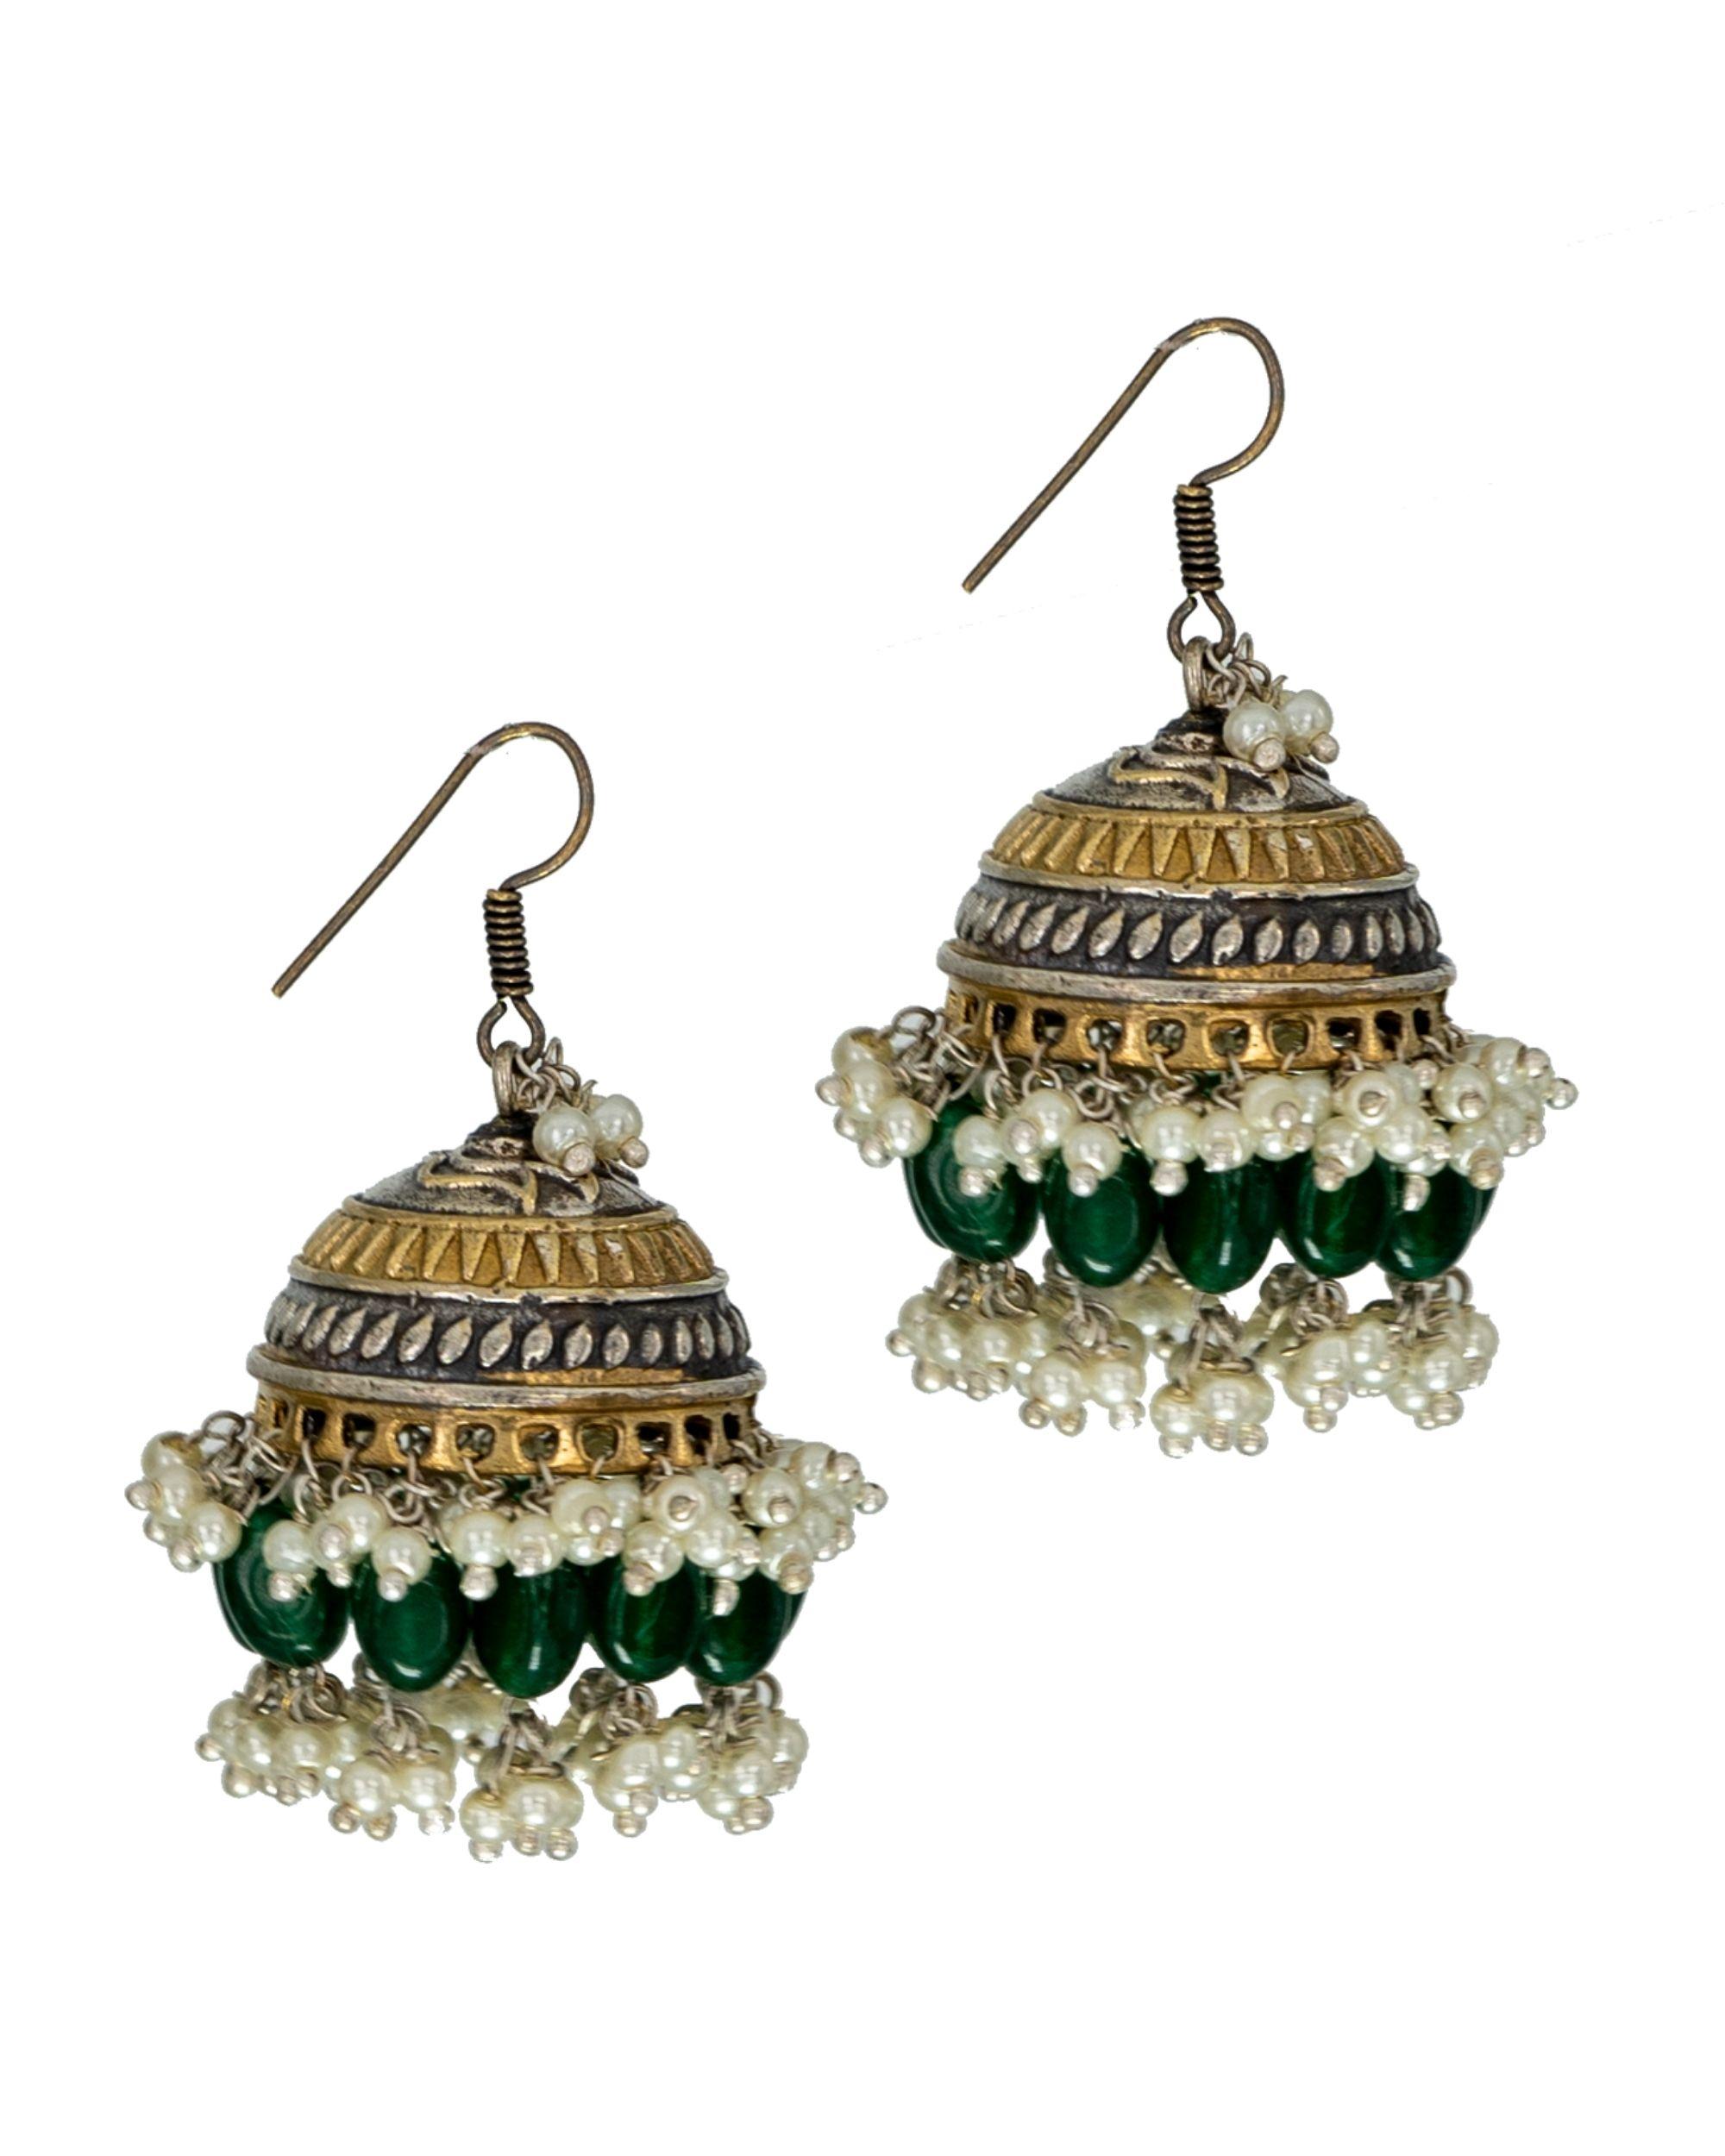 Green and white bead embellished jhumka